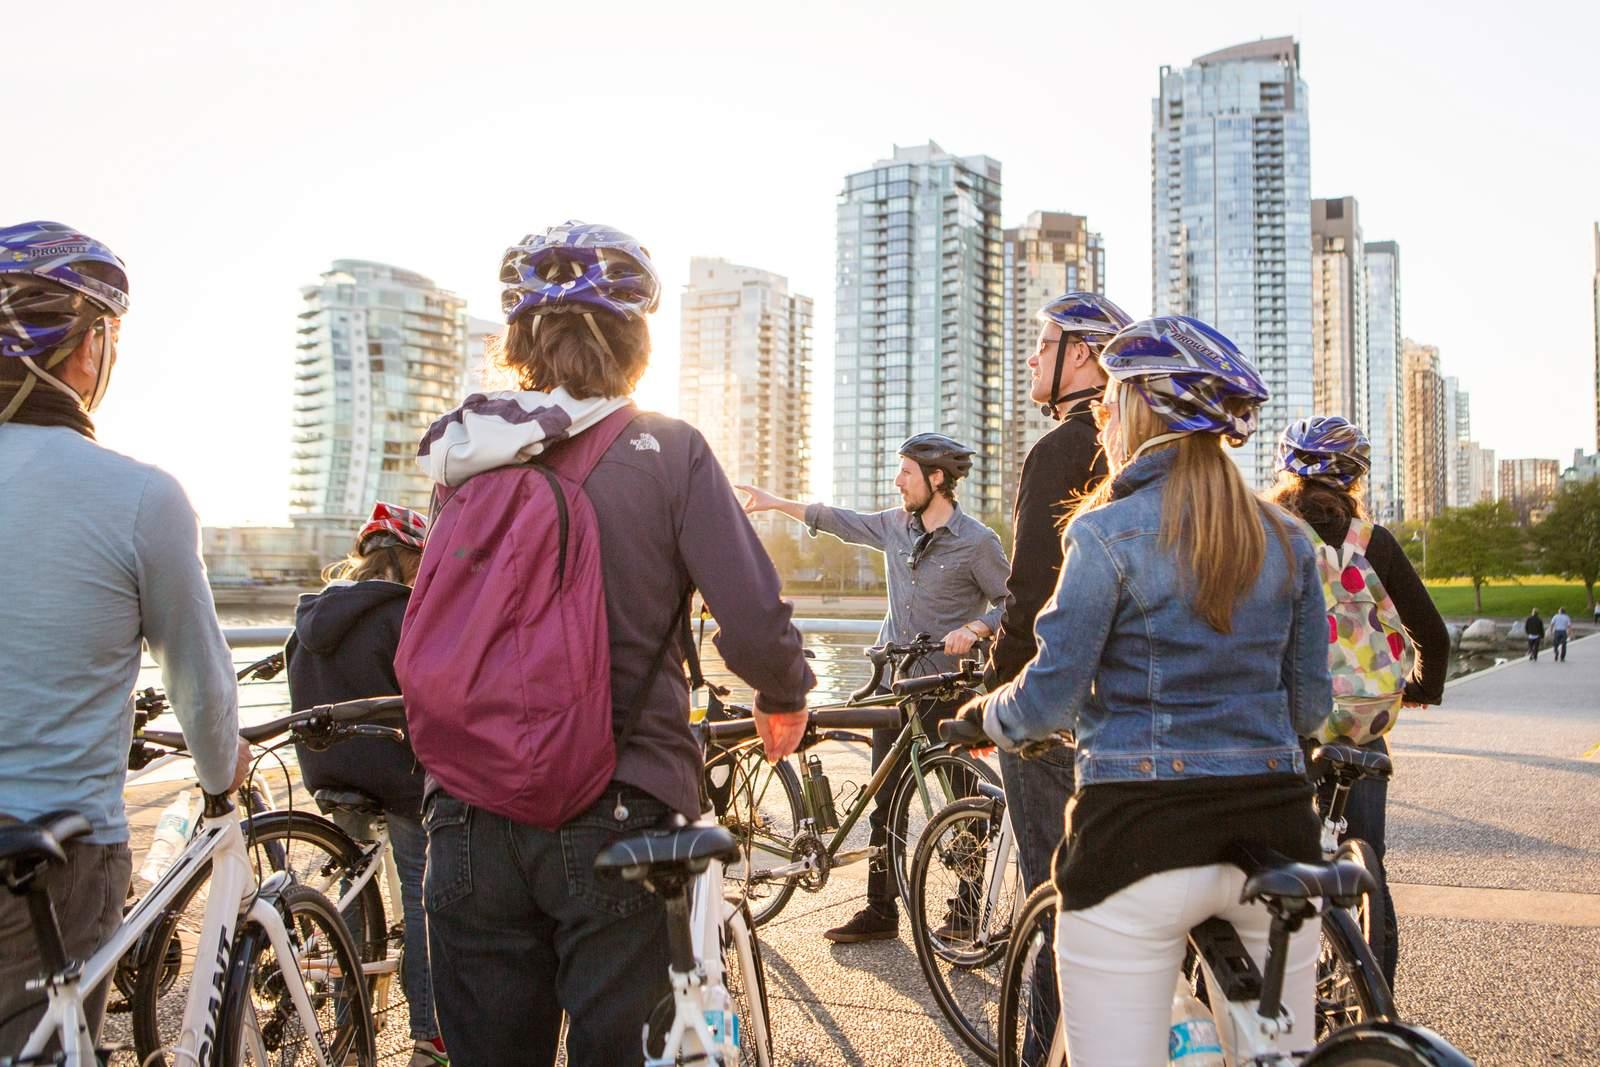 Fahrradtour durch False Creek in Vancouver, British Columbia